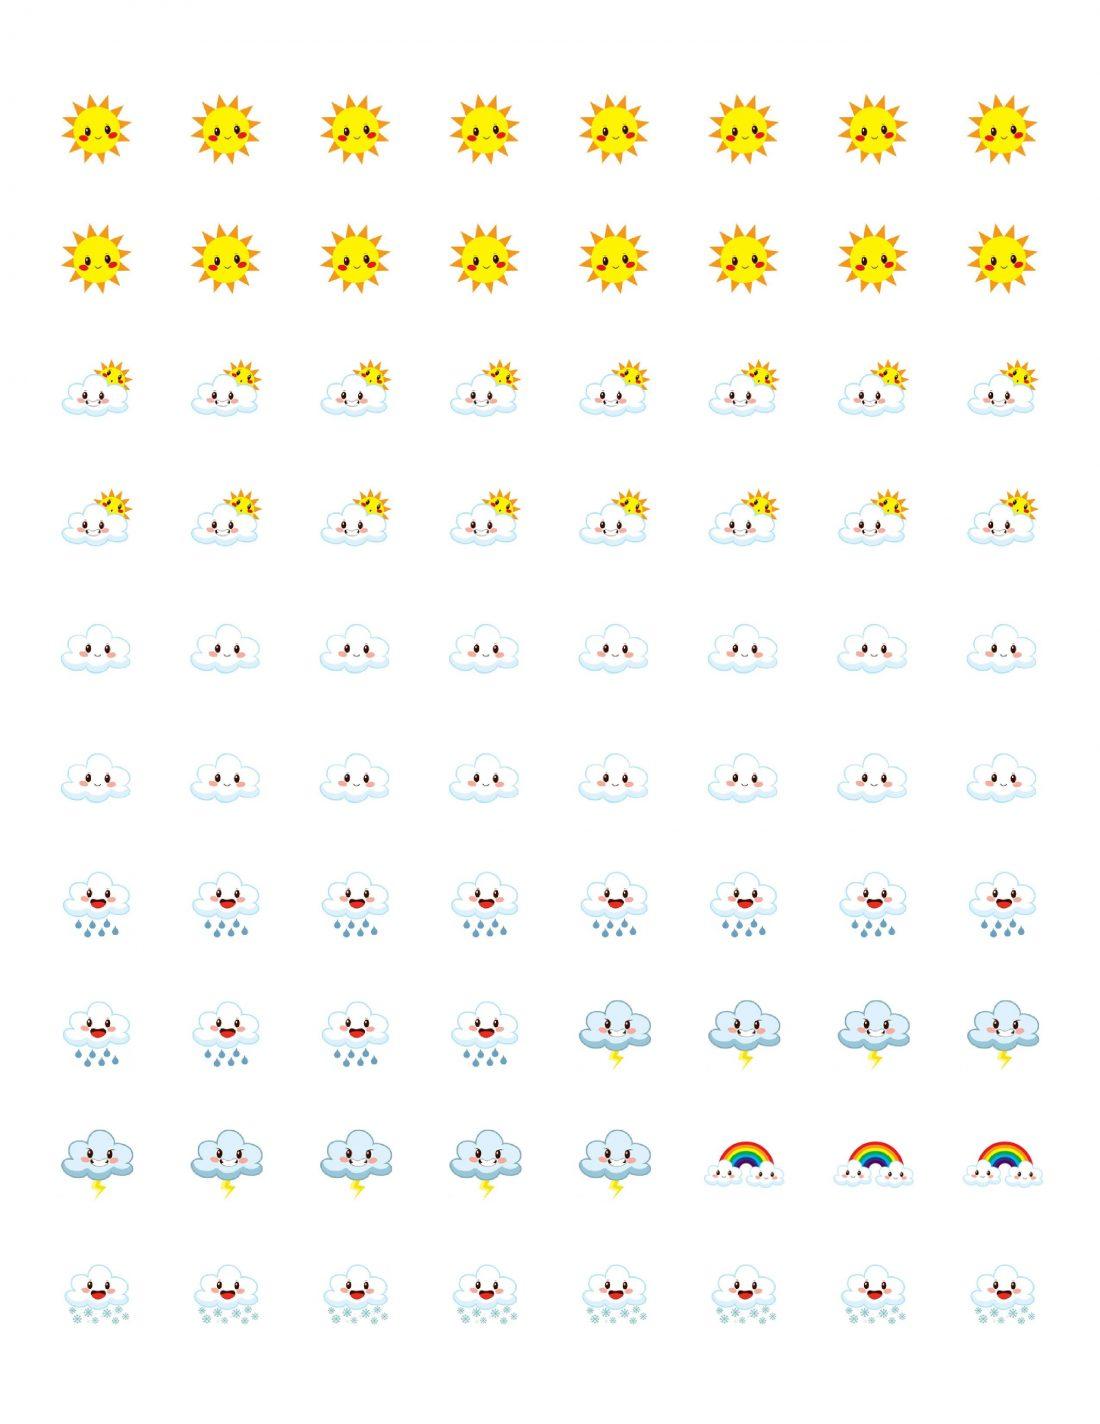 Free Printable Planner Stickers - Weather Icons | Mini Van ...